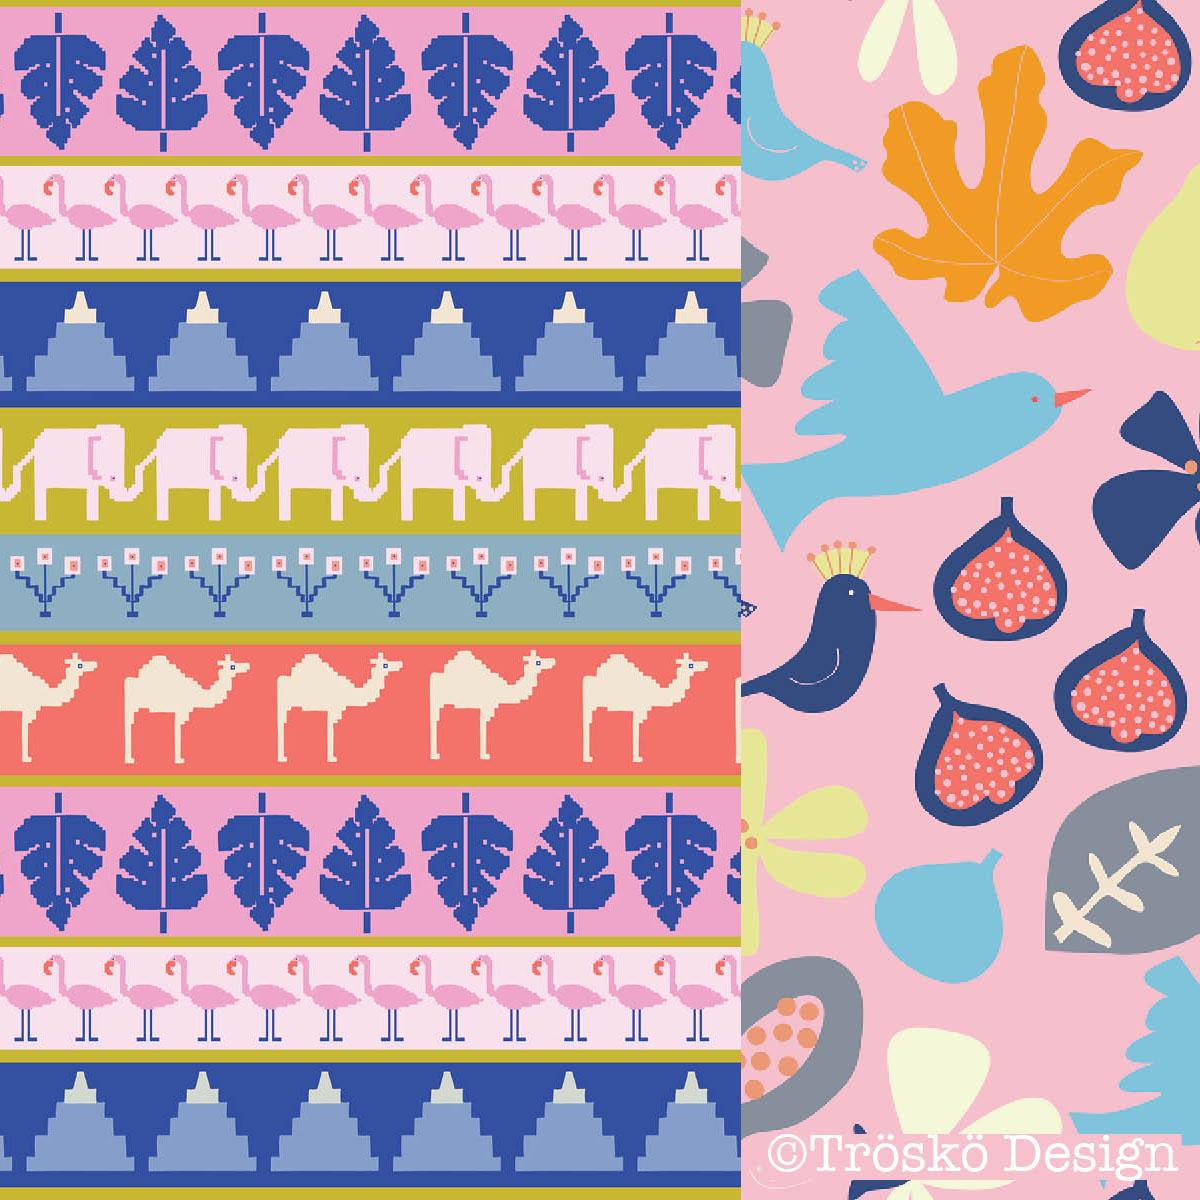 Trosko-Design_birds_Pattern-Observer